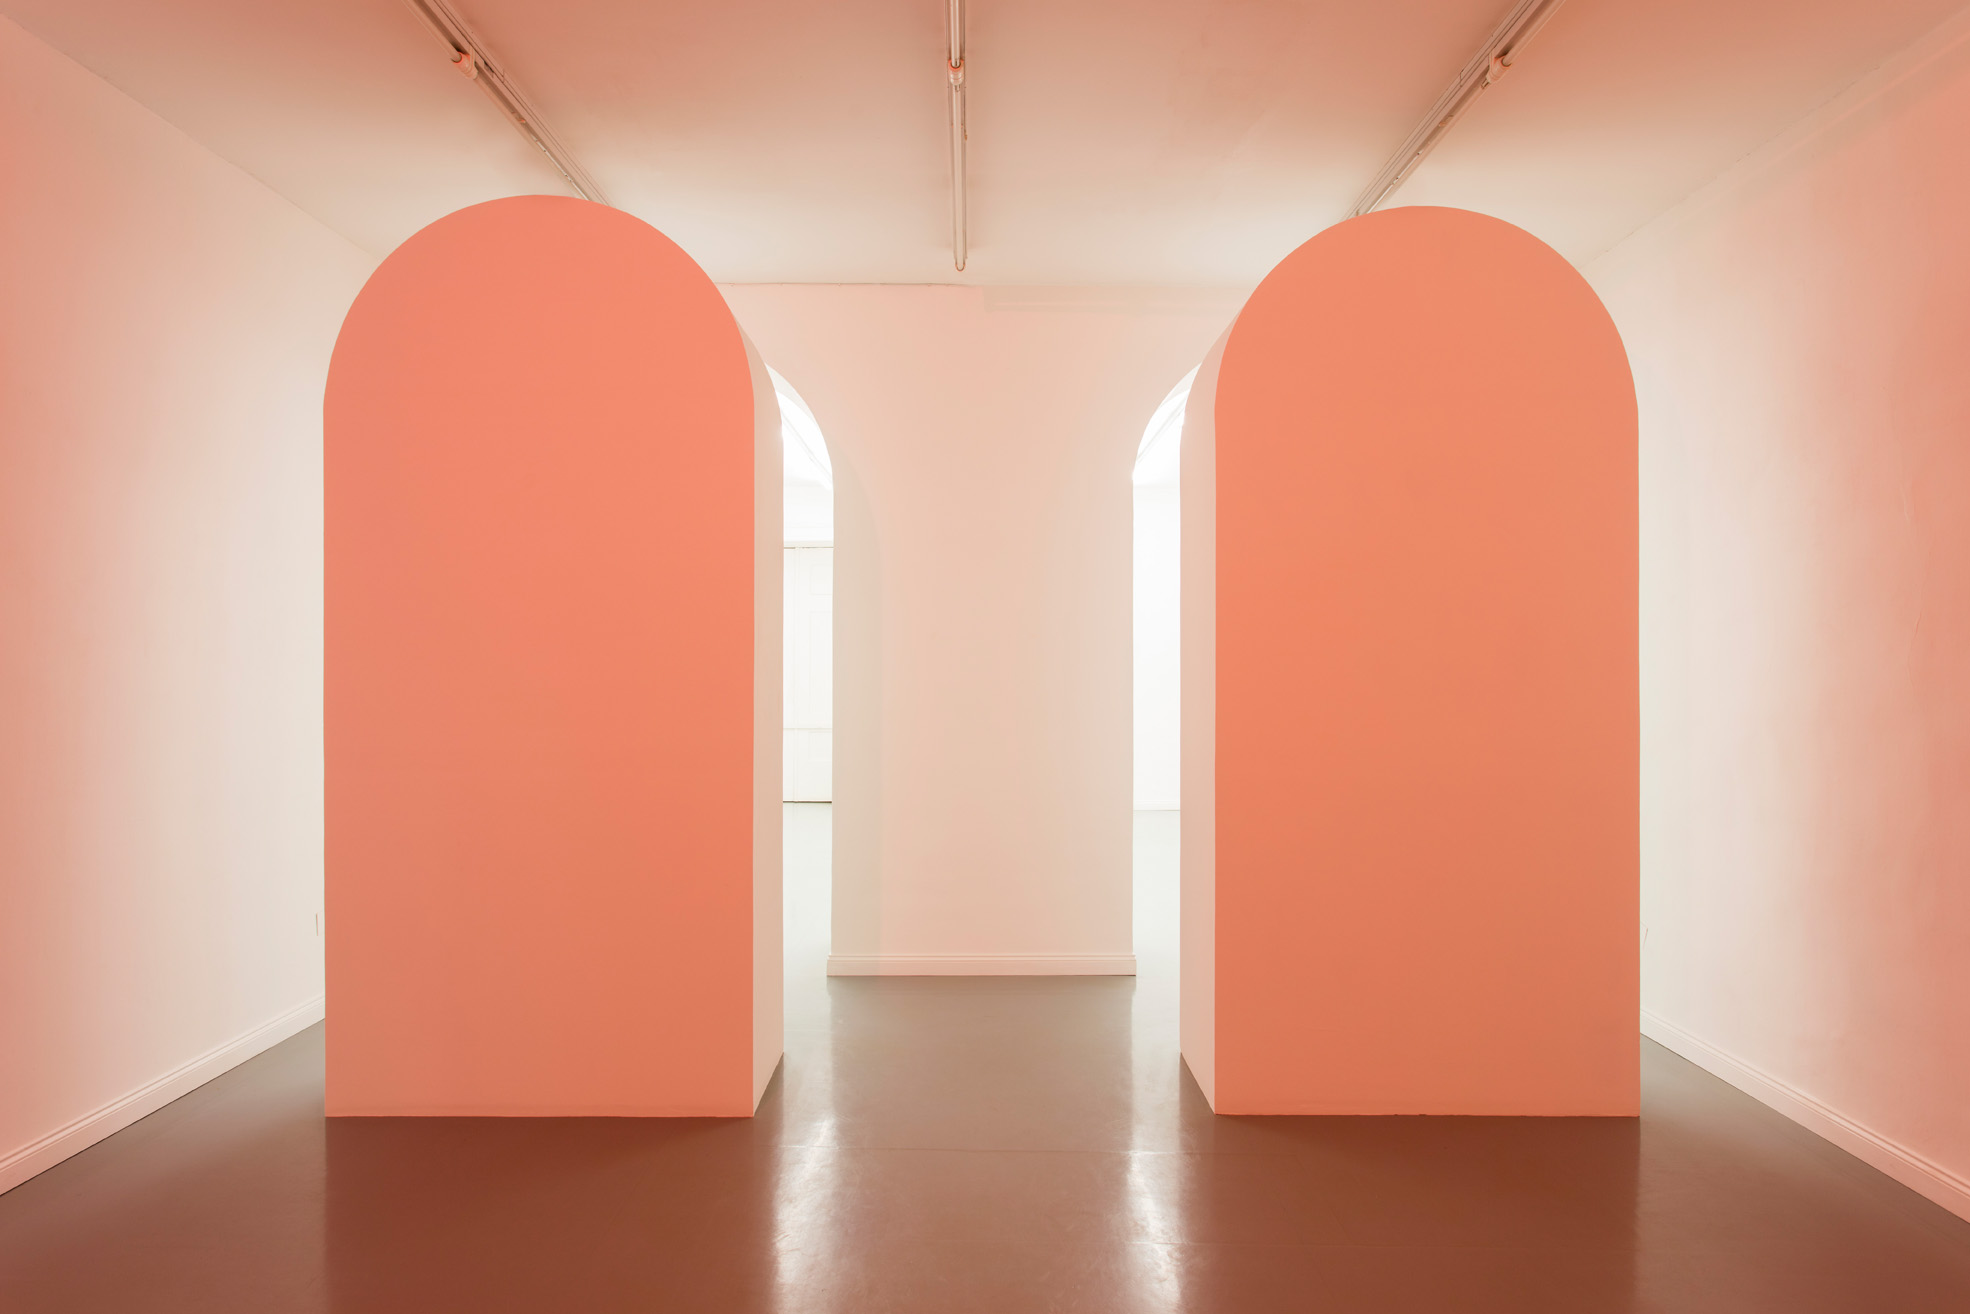 Delia Gonzalez, The Osris Gate I & II, 2017, drywall, cm. 57 x 126 x 22 inches. Exhibition view, Galleria Fonti Napoli.